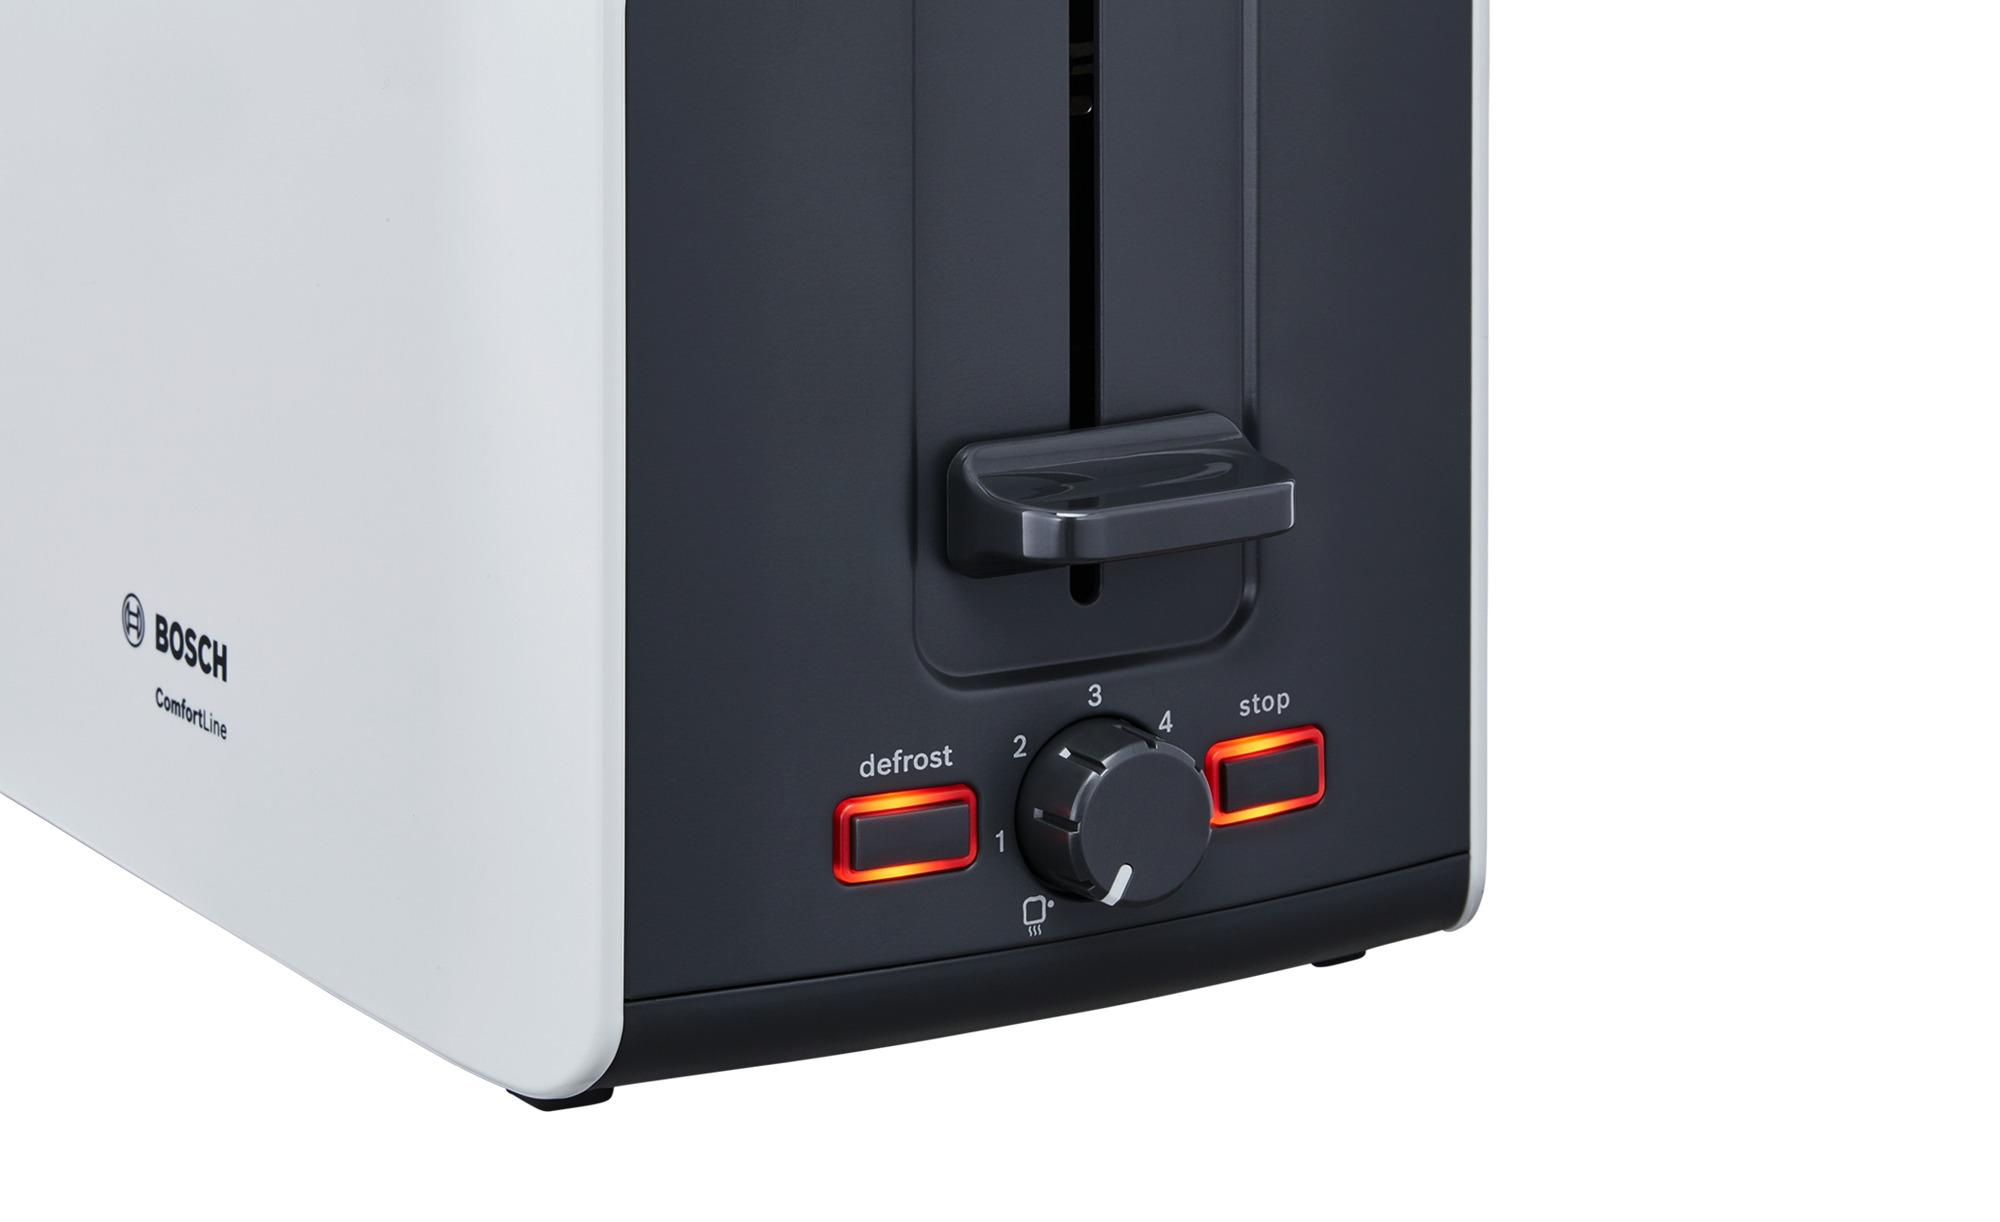 BOSCH Toaster  TAT 6A111 ¦ weiß ¦ Metall  Kunststoff ¦ Maße (cm): B: 30 7 H: 18 8 T: 17 Elektrokleingeräte > Toaster - Höffner   Küche und Esszimmer > Küchengeräte > Toaster   Möbel Höffner DE